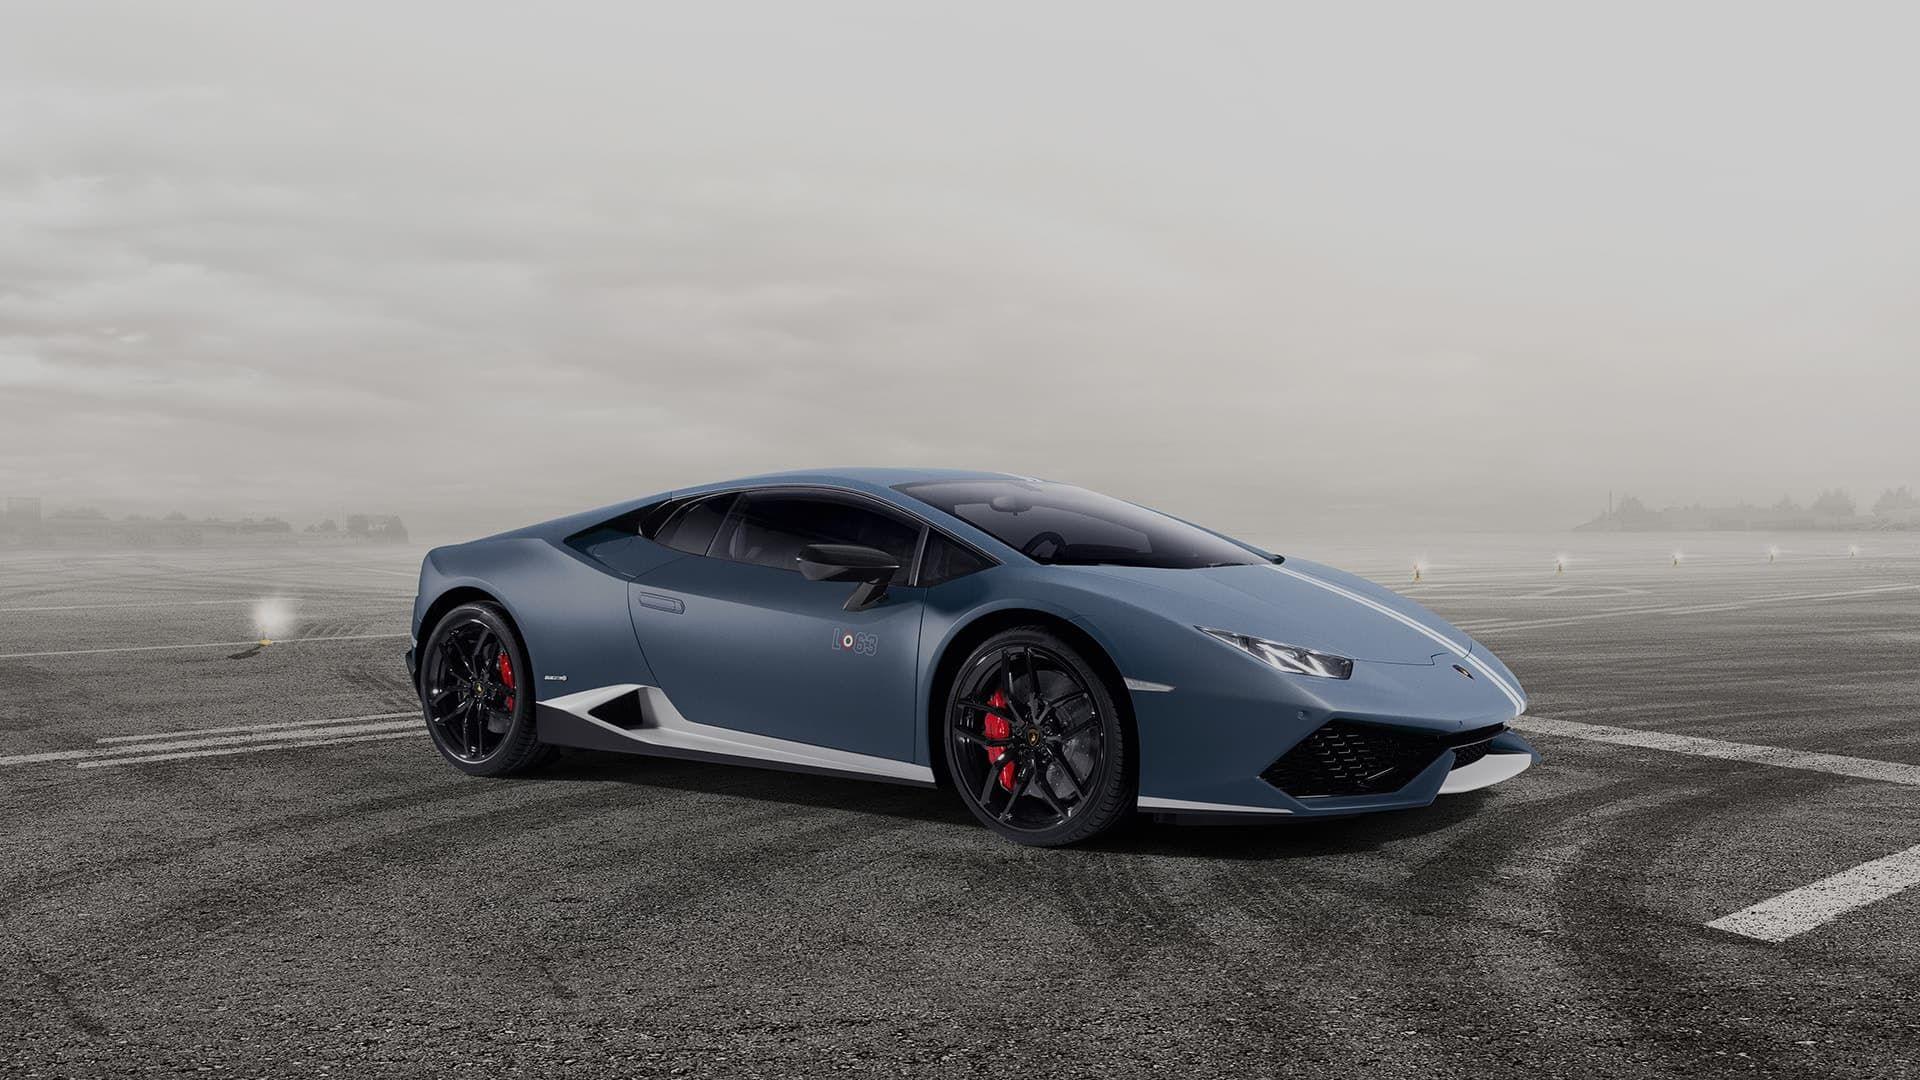 a8b09793b9c4d05b7637d084b8fc3afb Marvelous Lamborghini Huracan Price In Uae Cars Trend